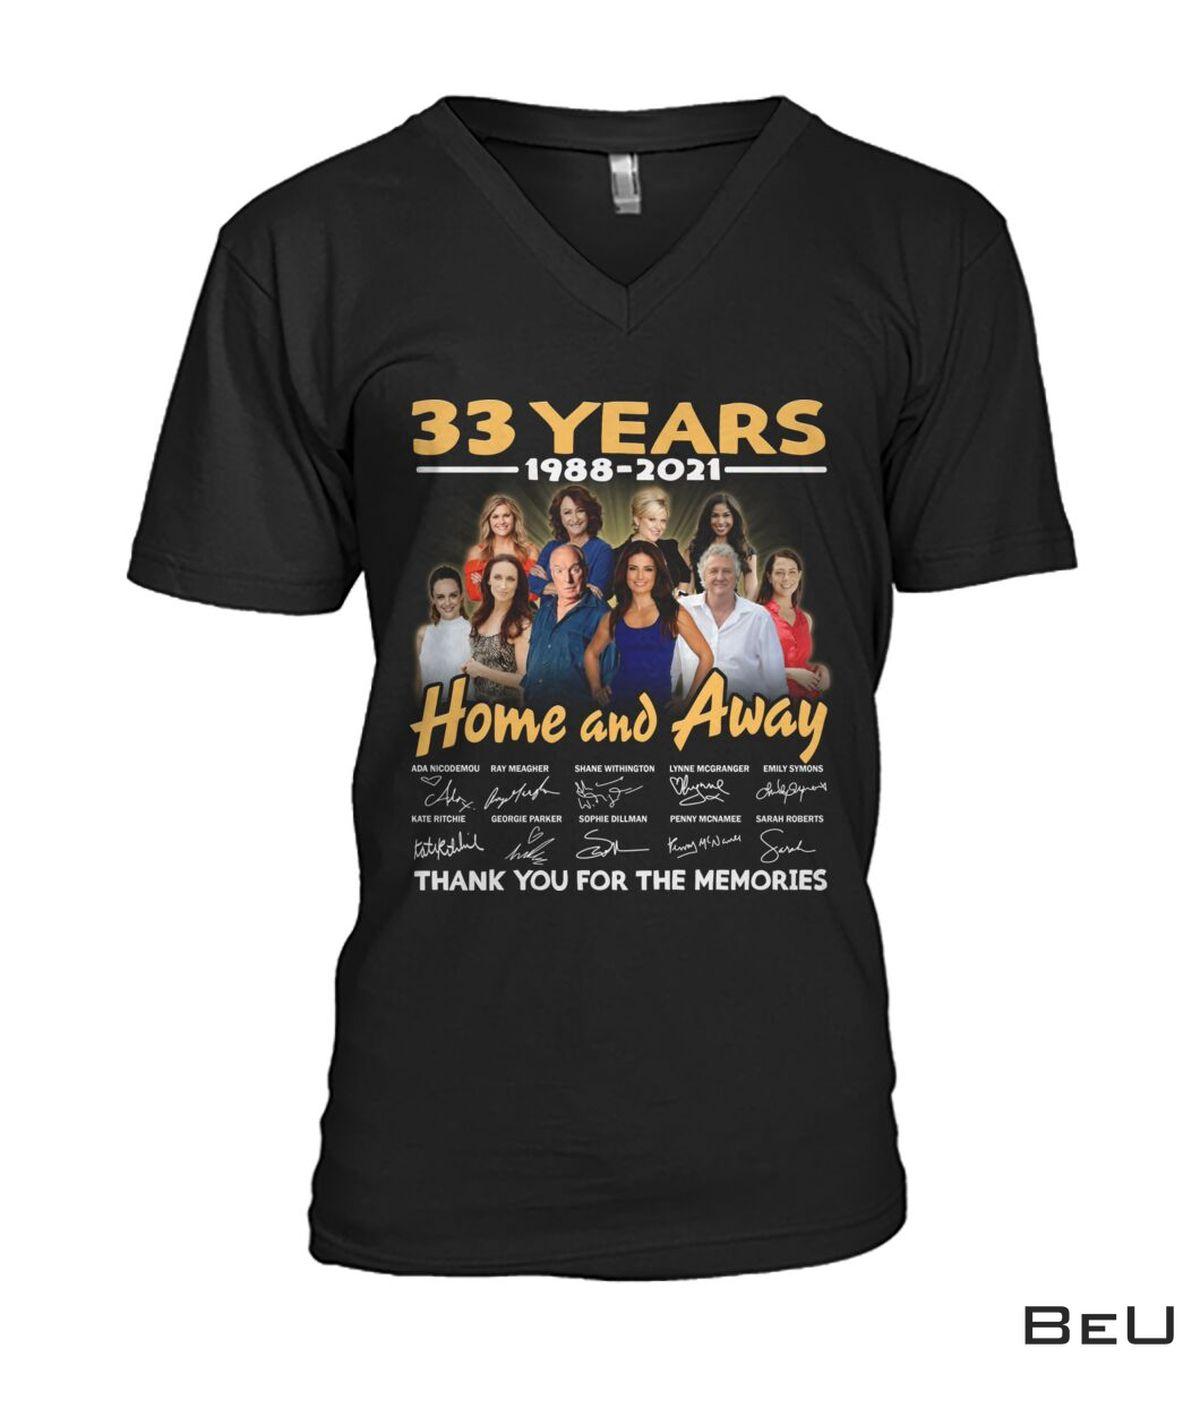 Best Gift 33 Years Anniversary Home And Away Shit, hoodie, tank top